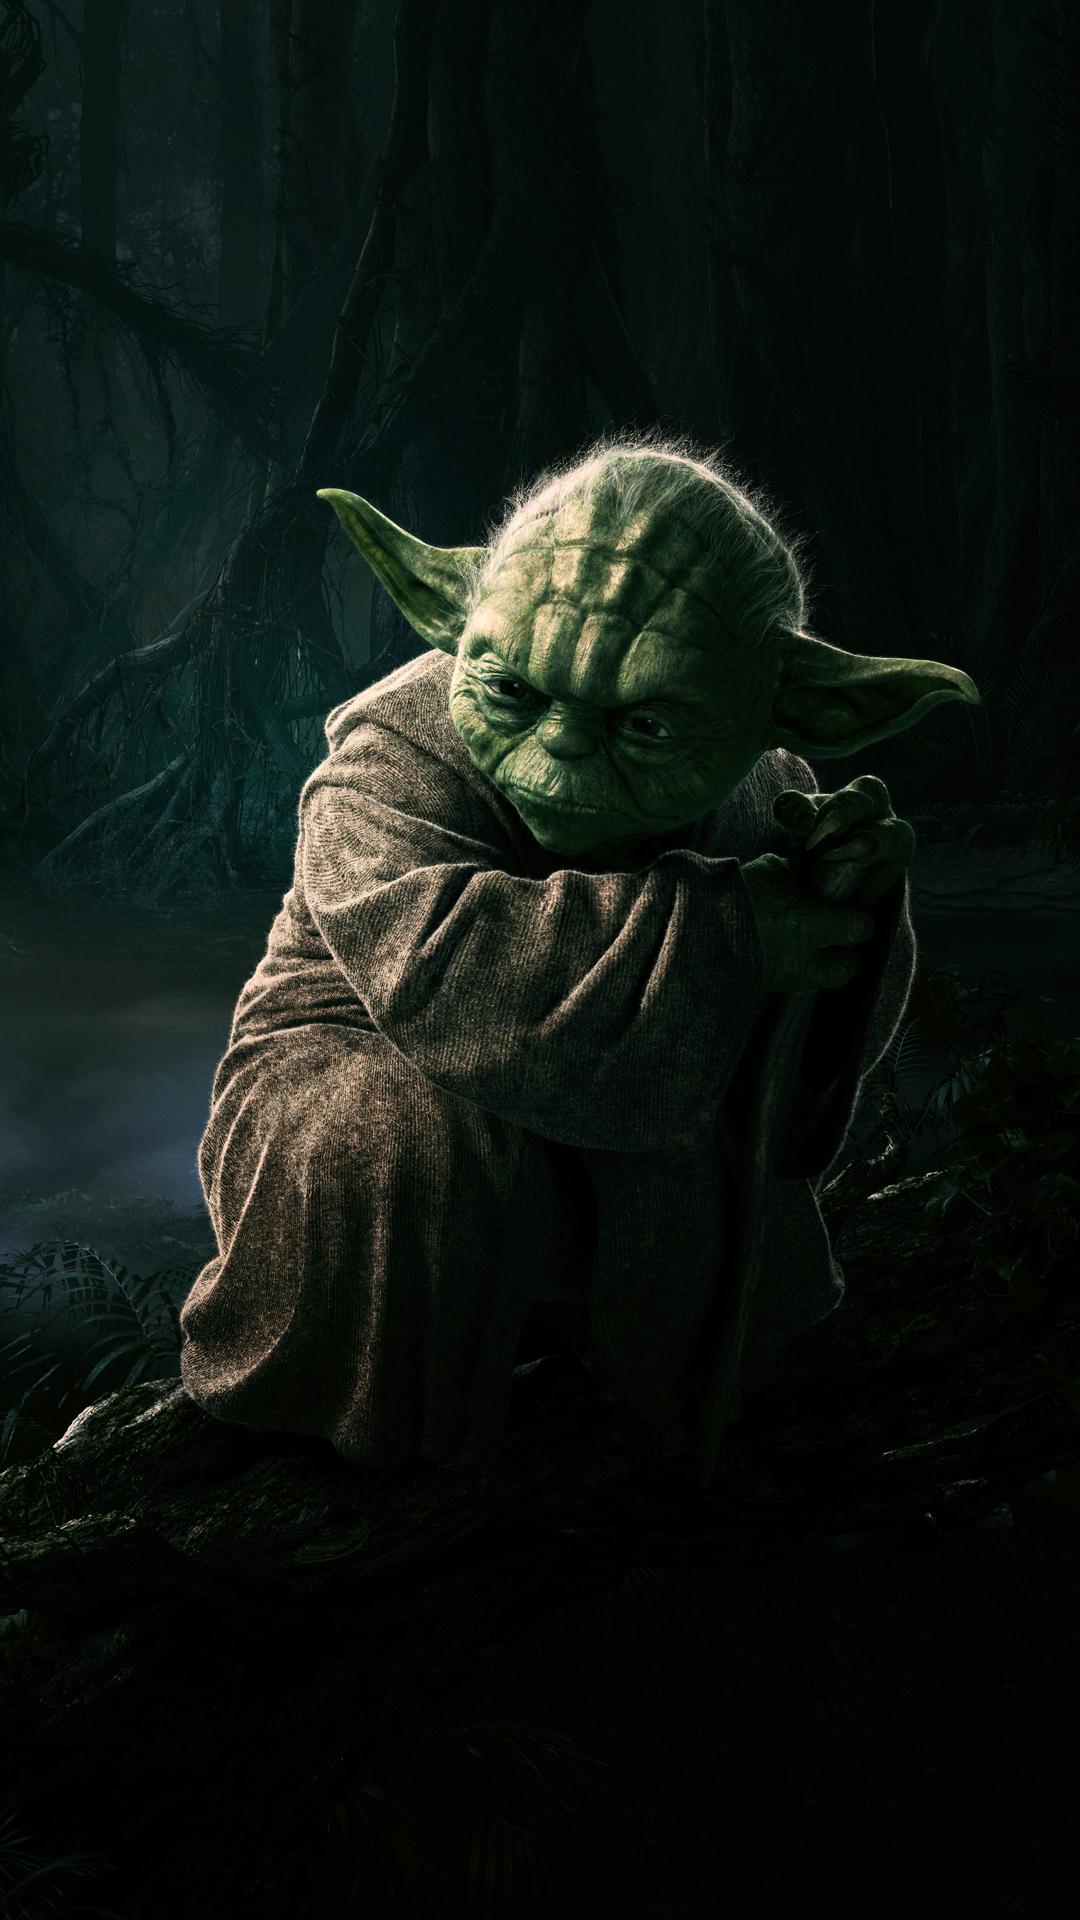 Star Wars Android Wallpaper - HD Wallpaper